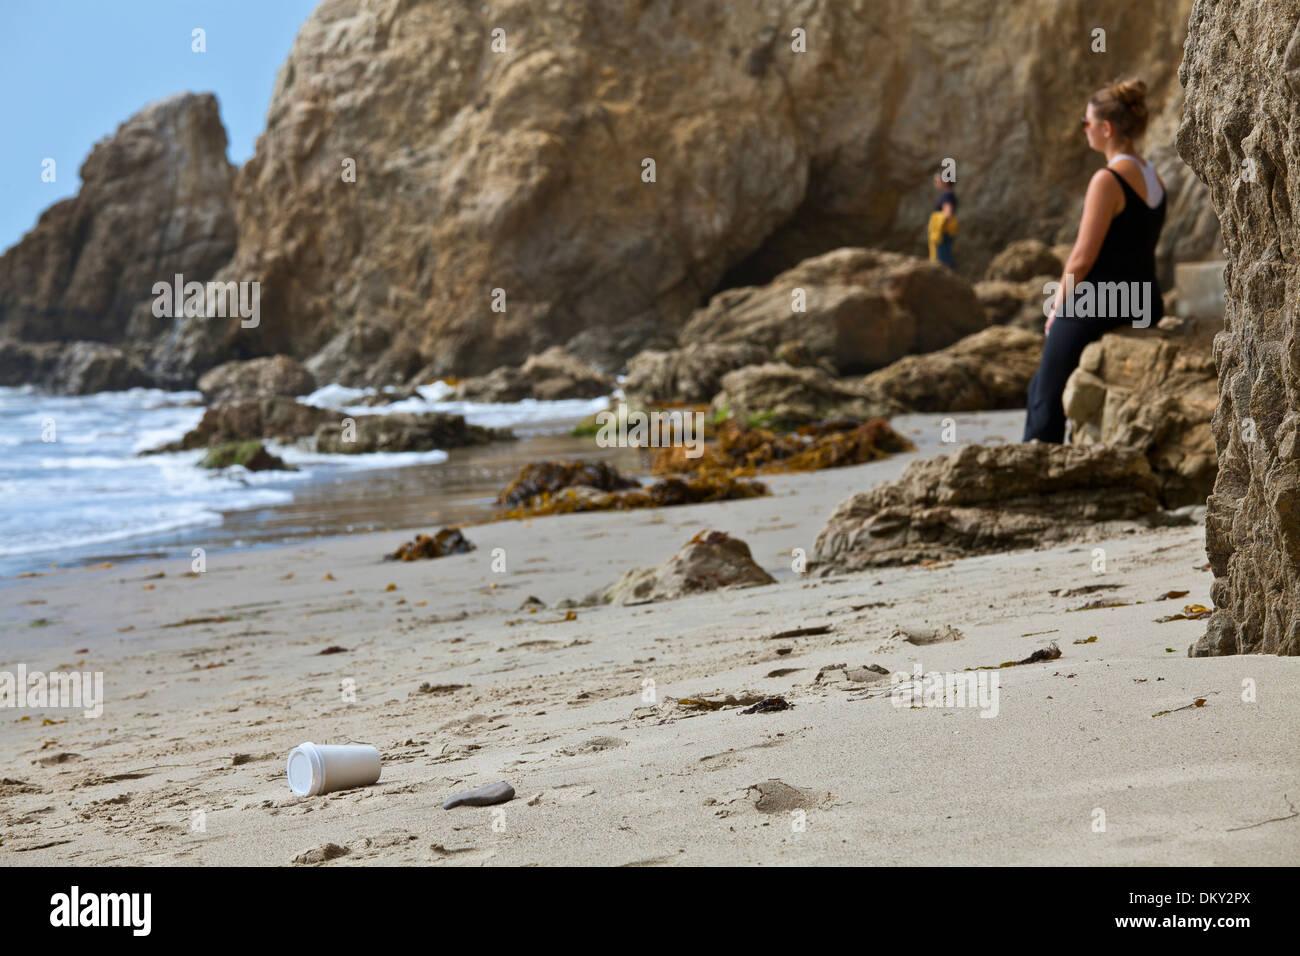 Discarded coffee cup on El Matador State Beach, Malibu, Los Angeles County, California - Stock Image